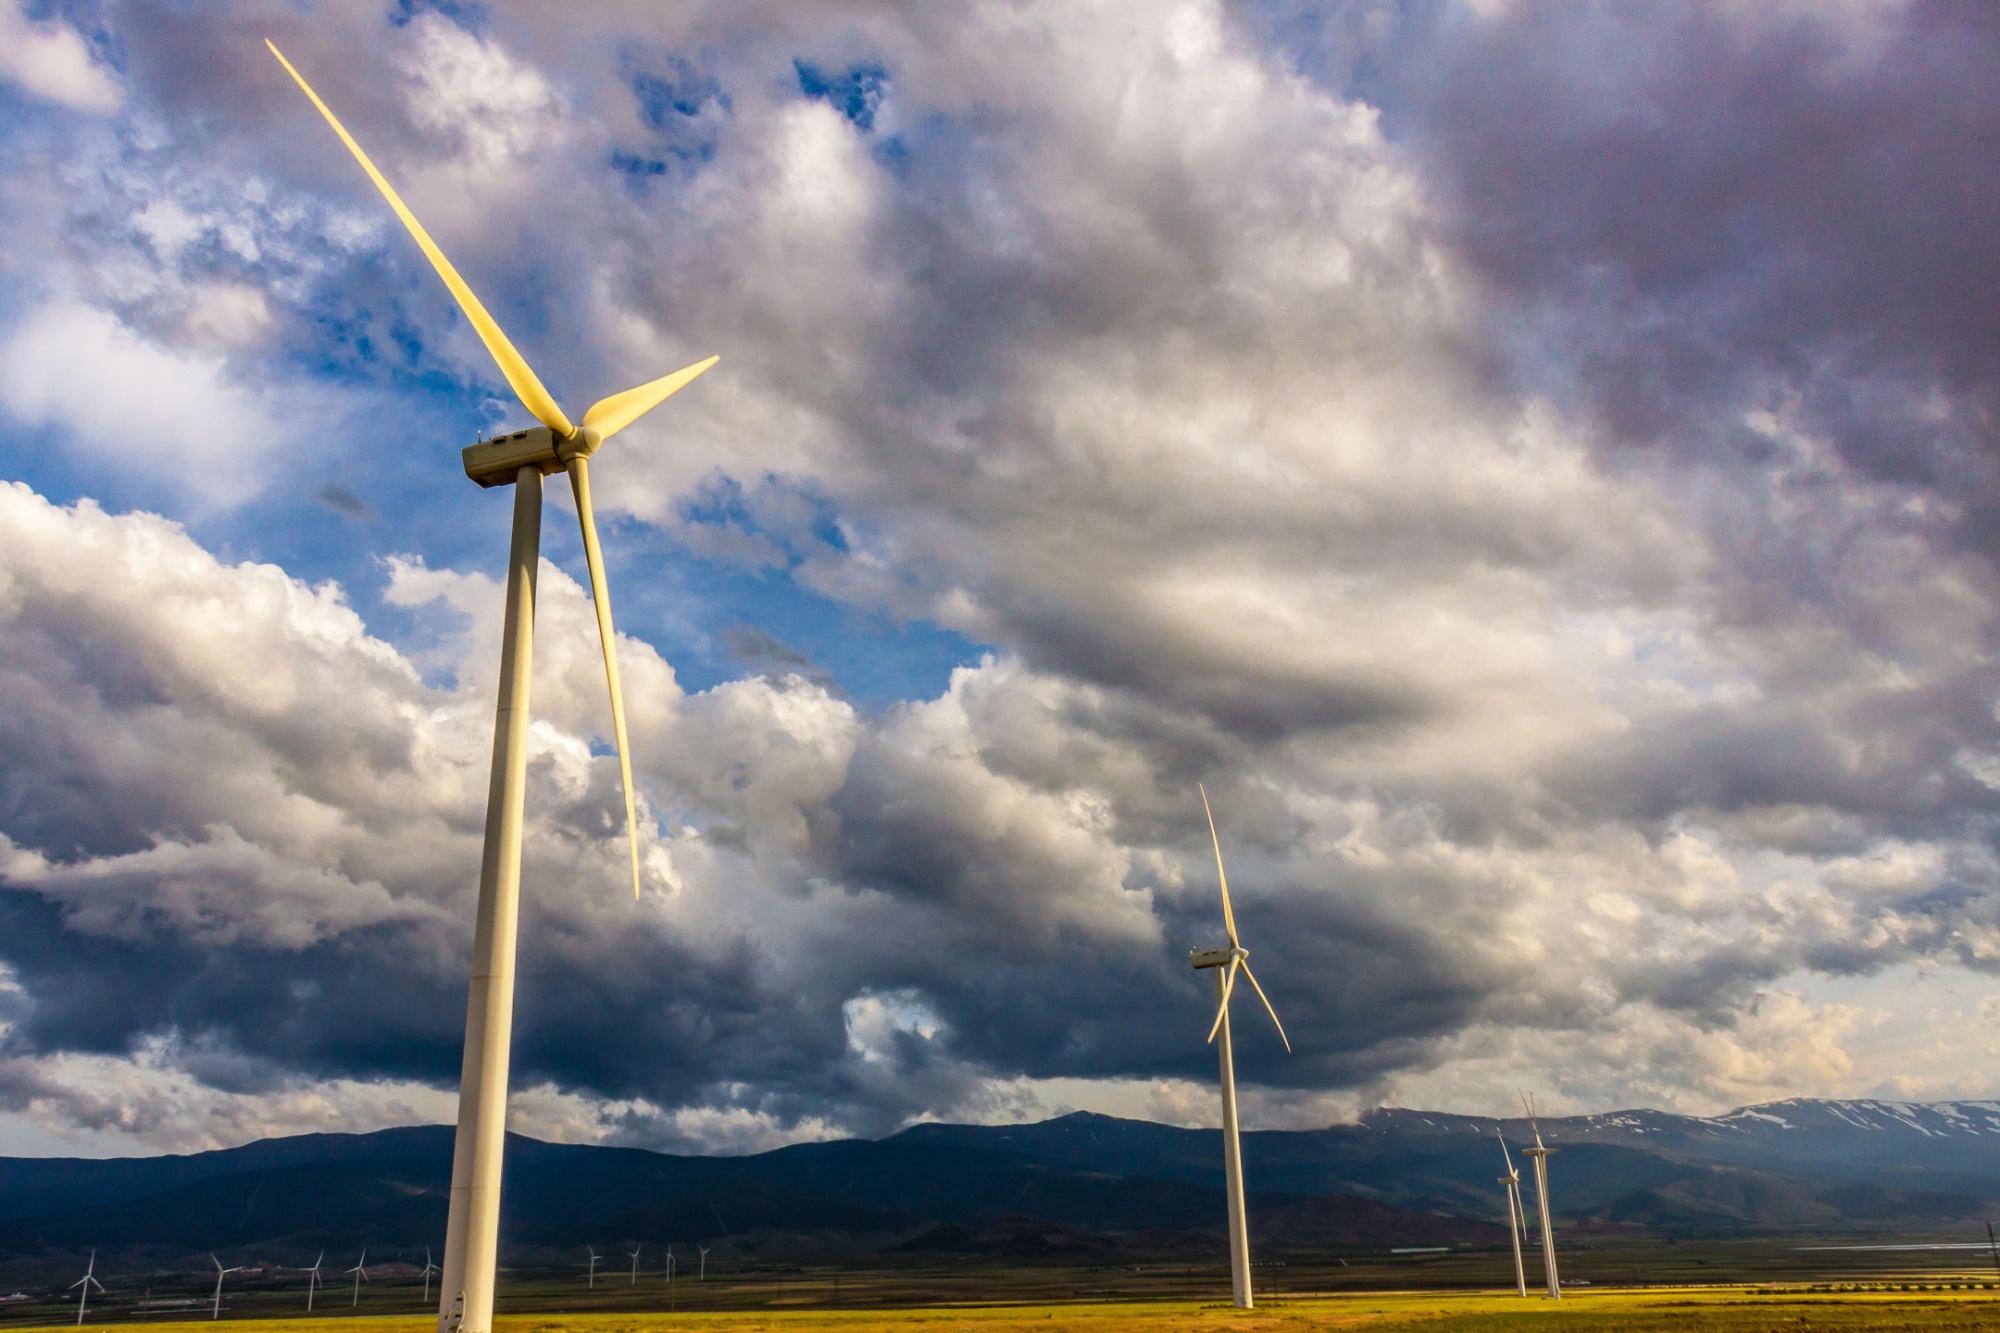 Kilgore Wind (Stock Photo) Edited